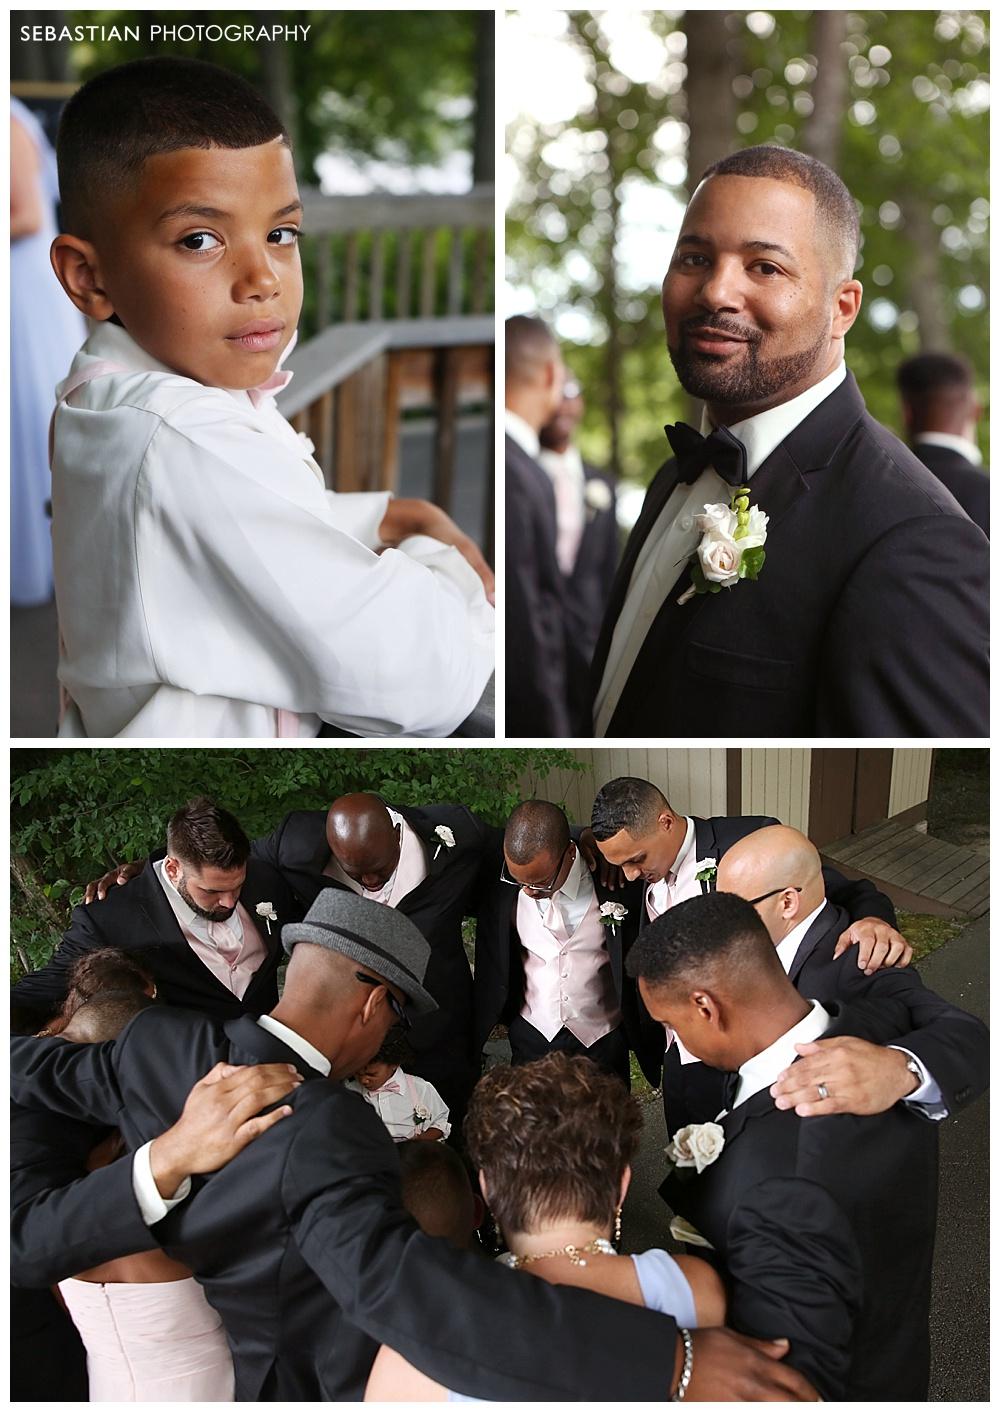 CT Wedding Photographer_Sebastian Photography_Lake of Isles_Outdoor Wedding_Murray_Bransford1023.jpg